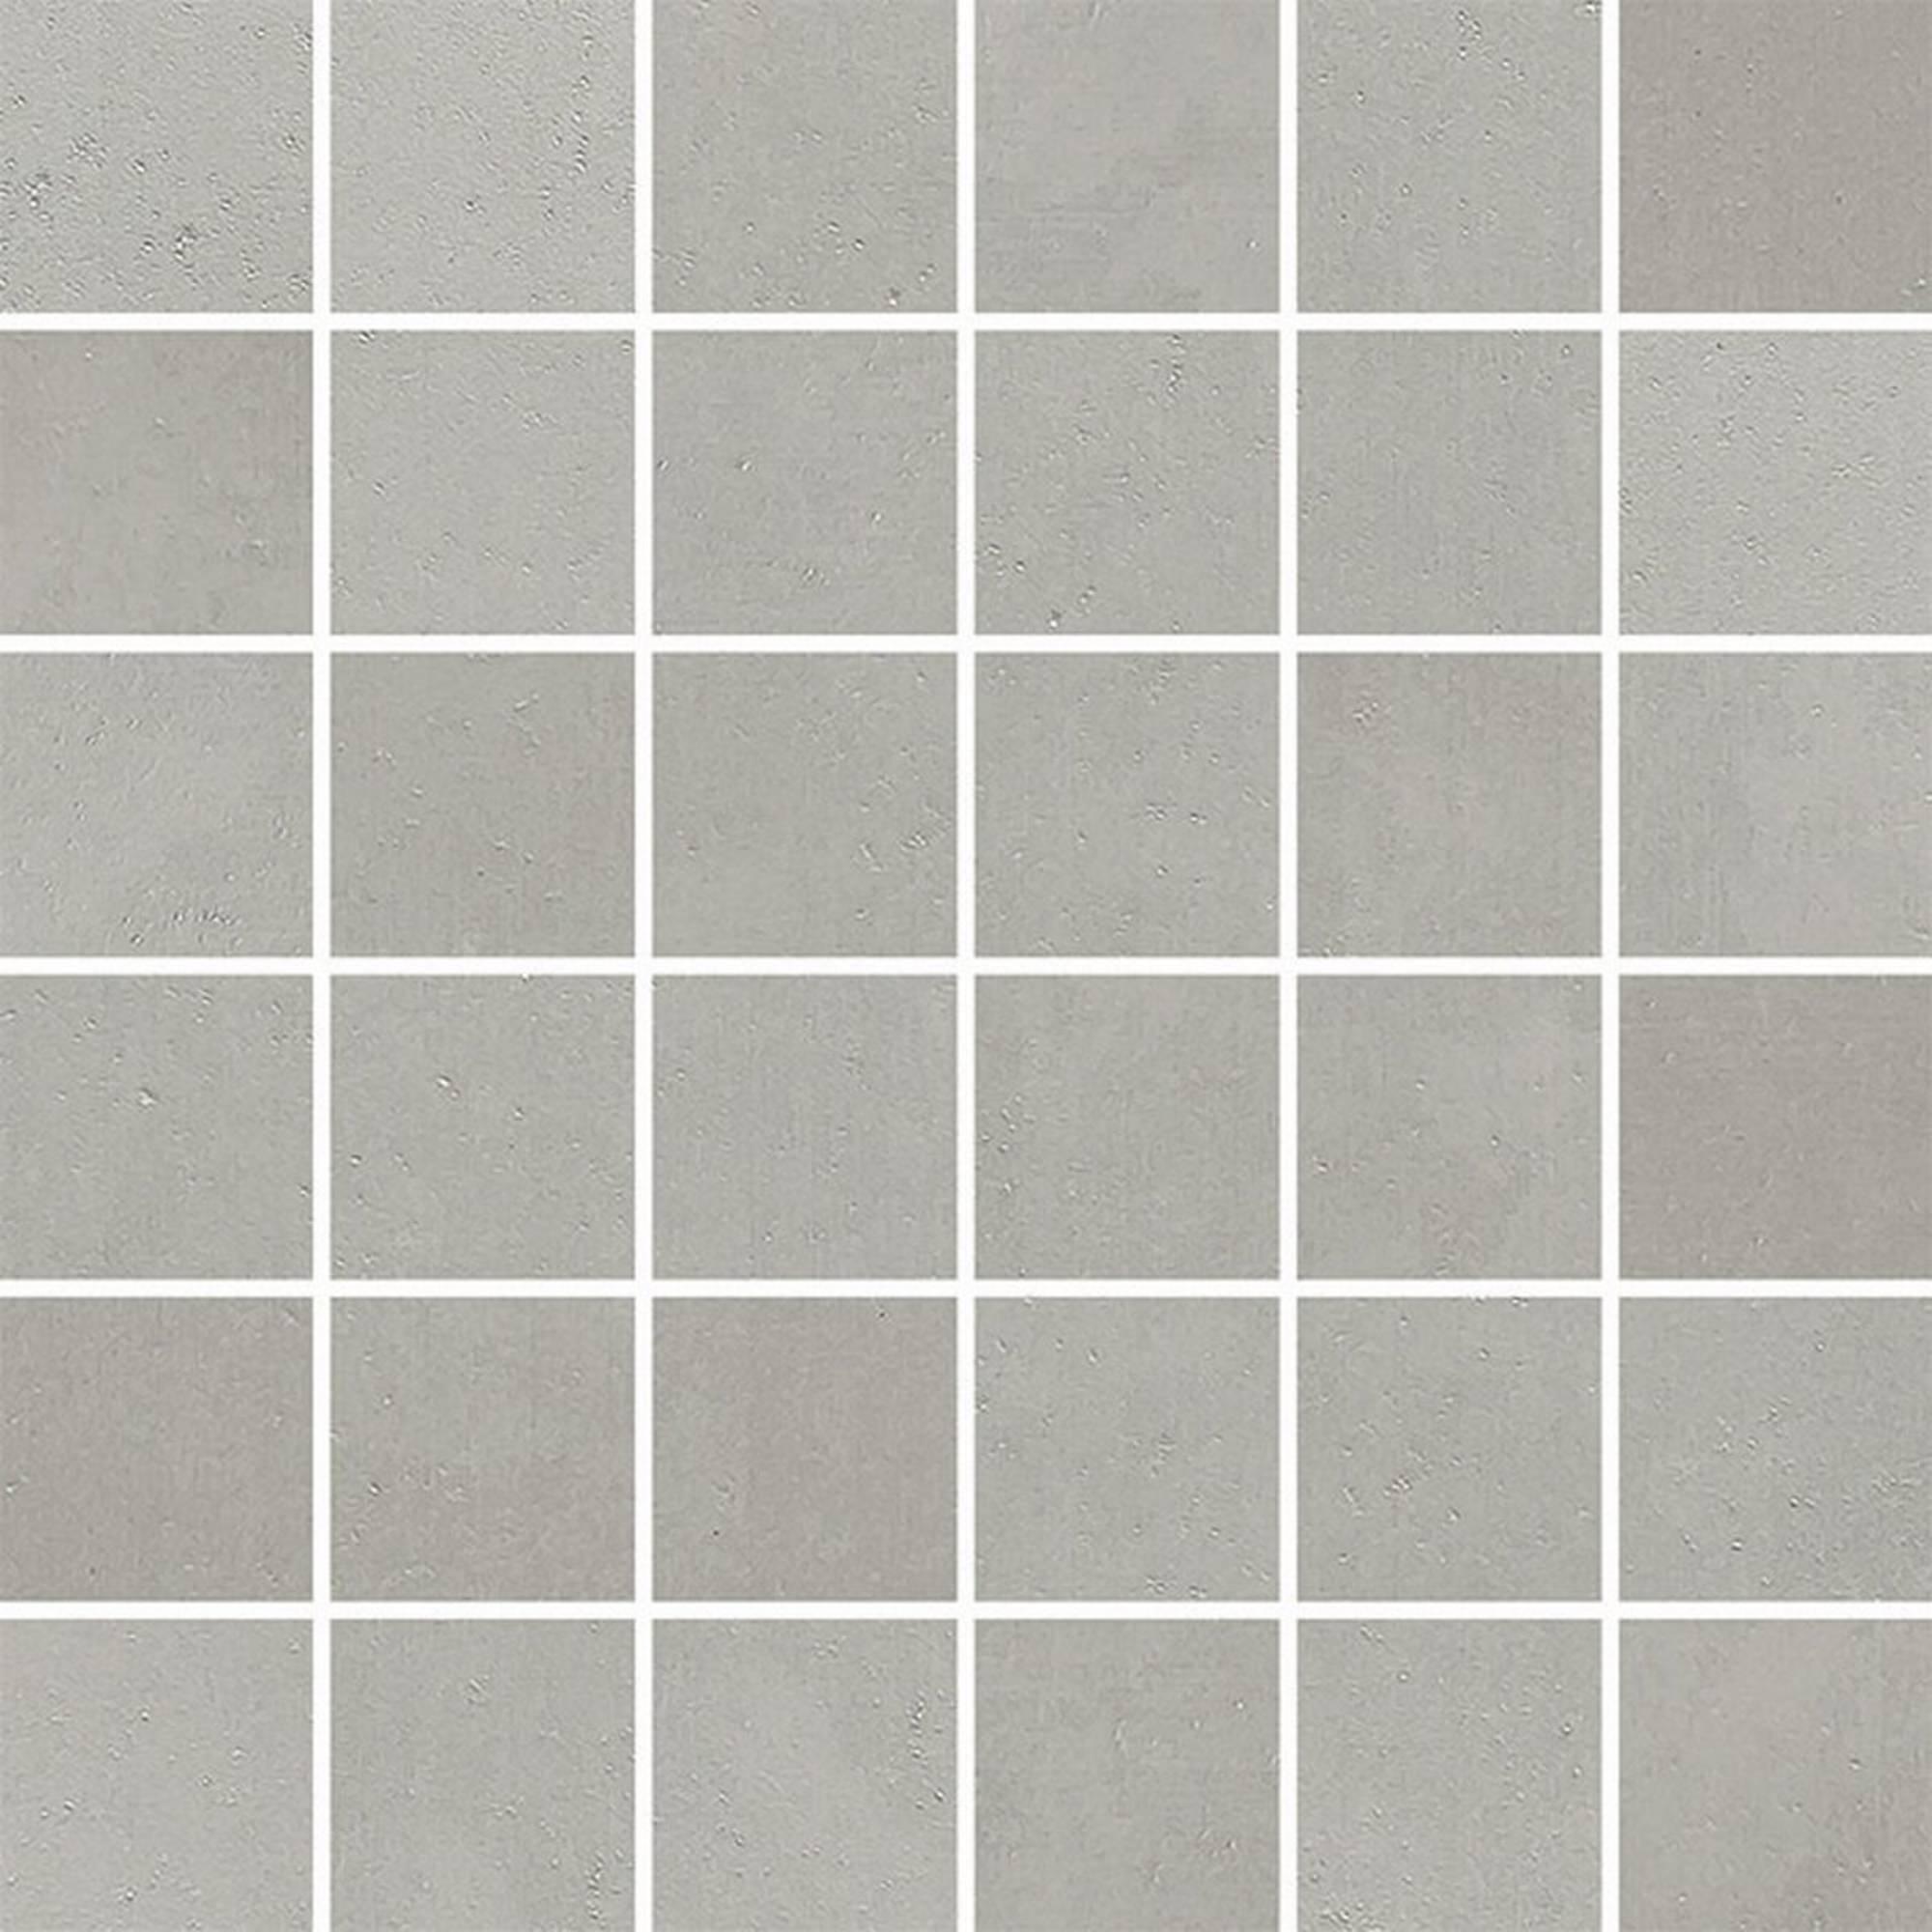 Villeroy & boch Century unlimited tegelmat 30x30 cm. blok 5 x 5 cm. a 11 stuks, midden grijs